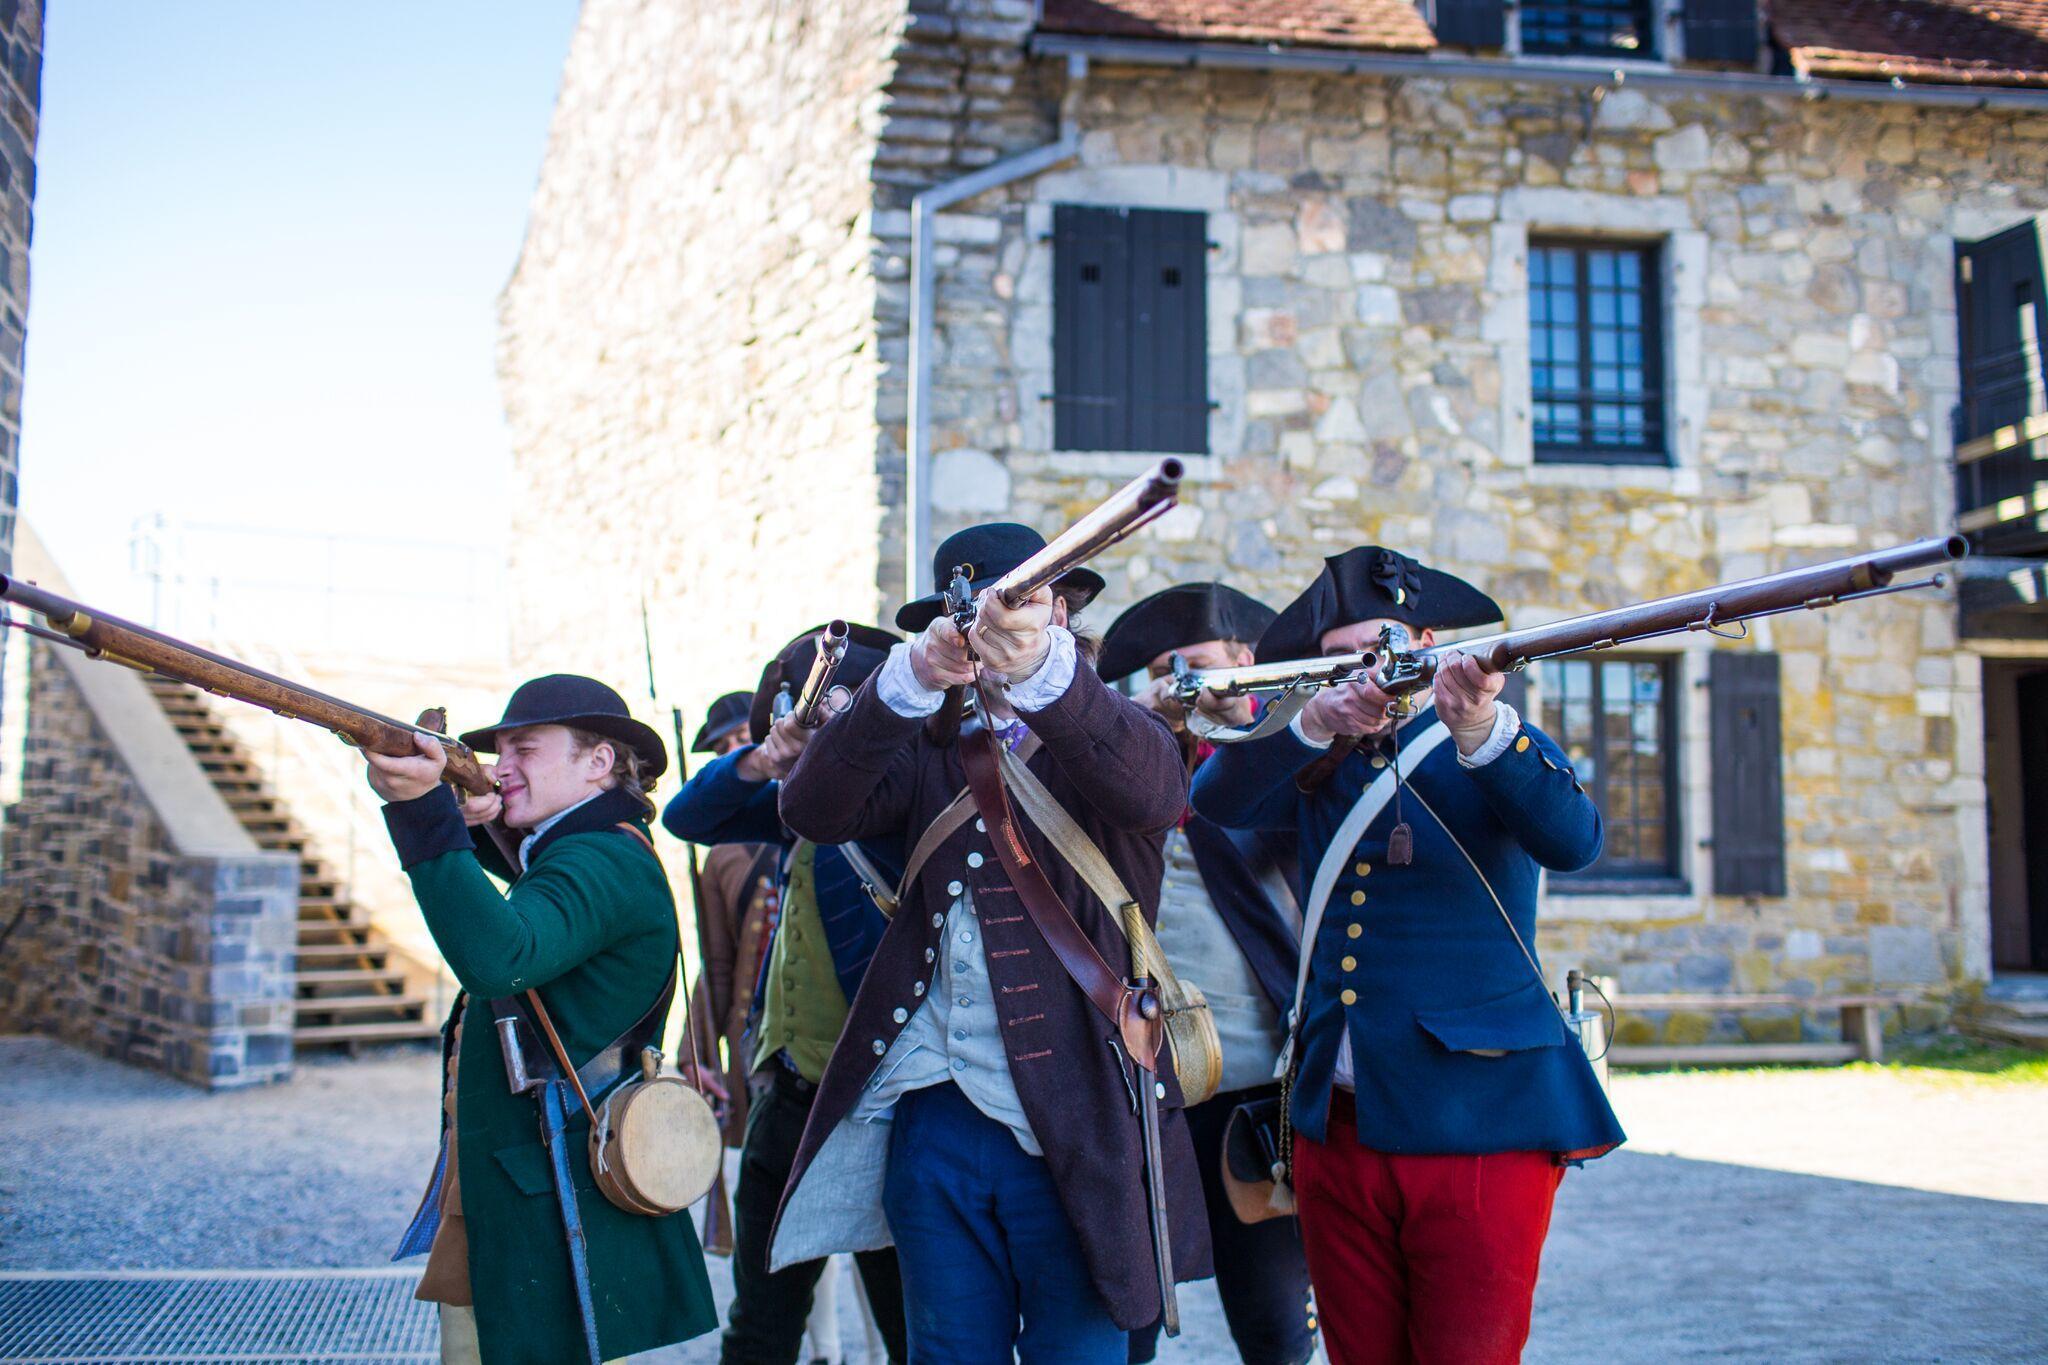 Fort Ticonderoga image 1